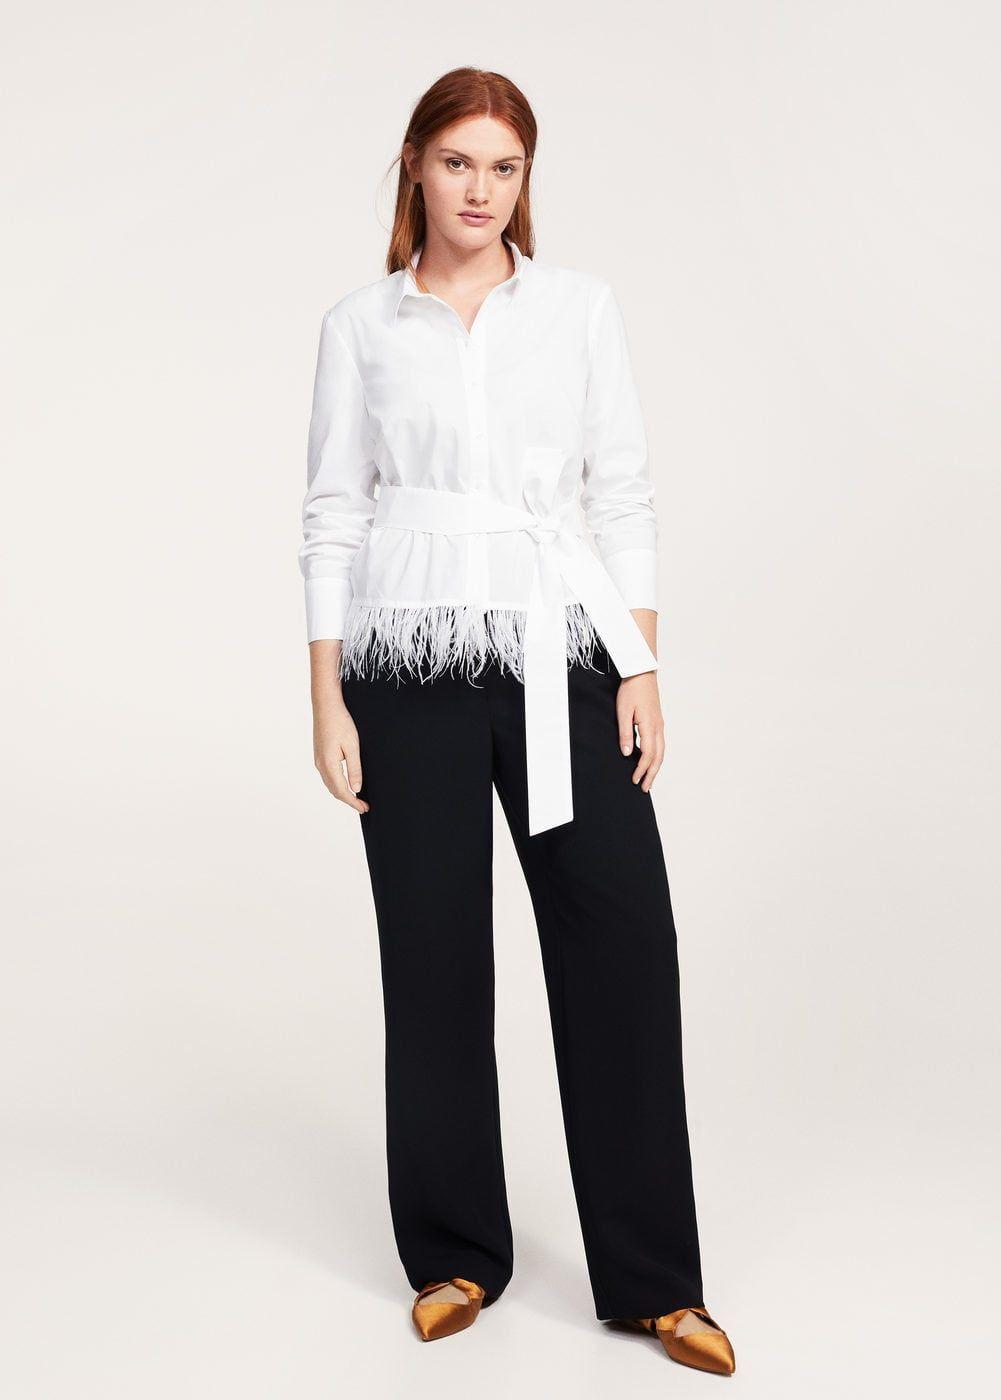 Shawl Collar Vegan Leather Dress | Womens Plus Size